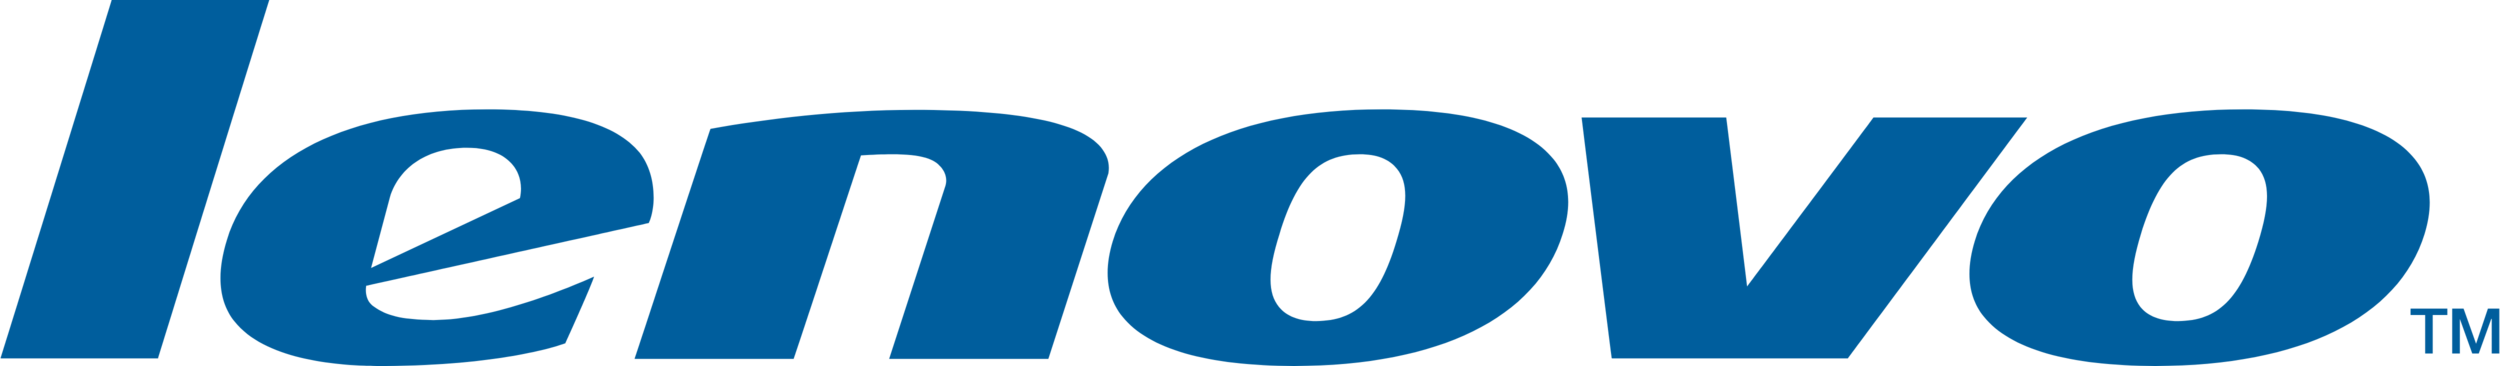 Lenovo_logo_tm.png